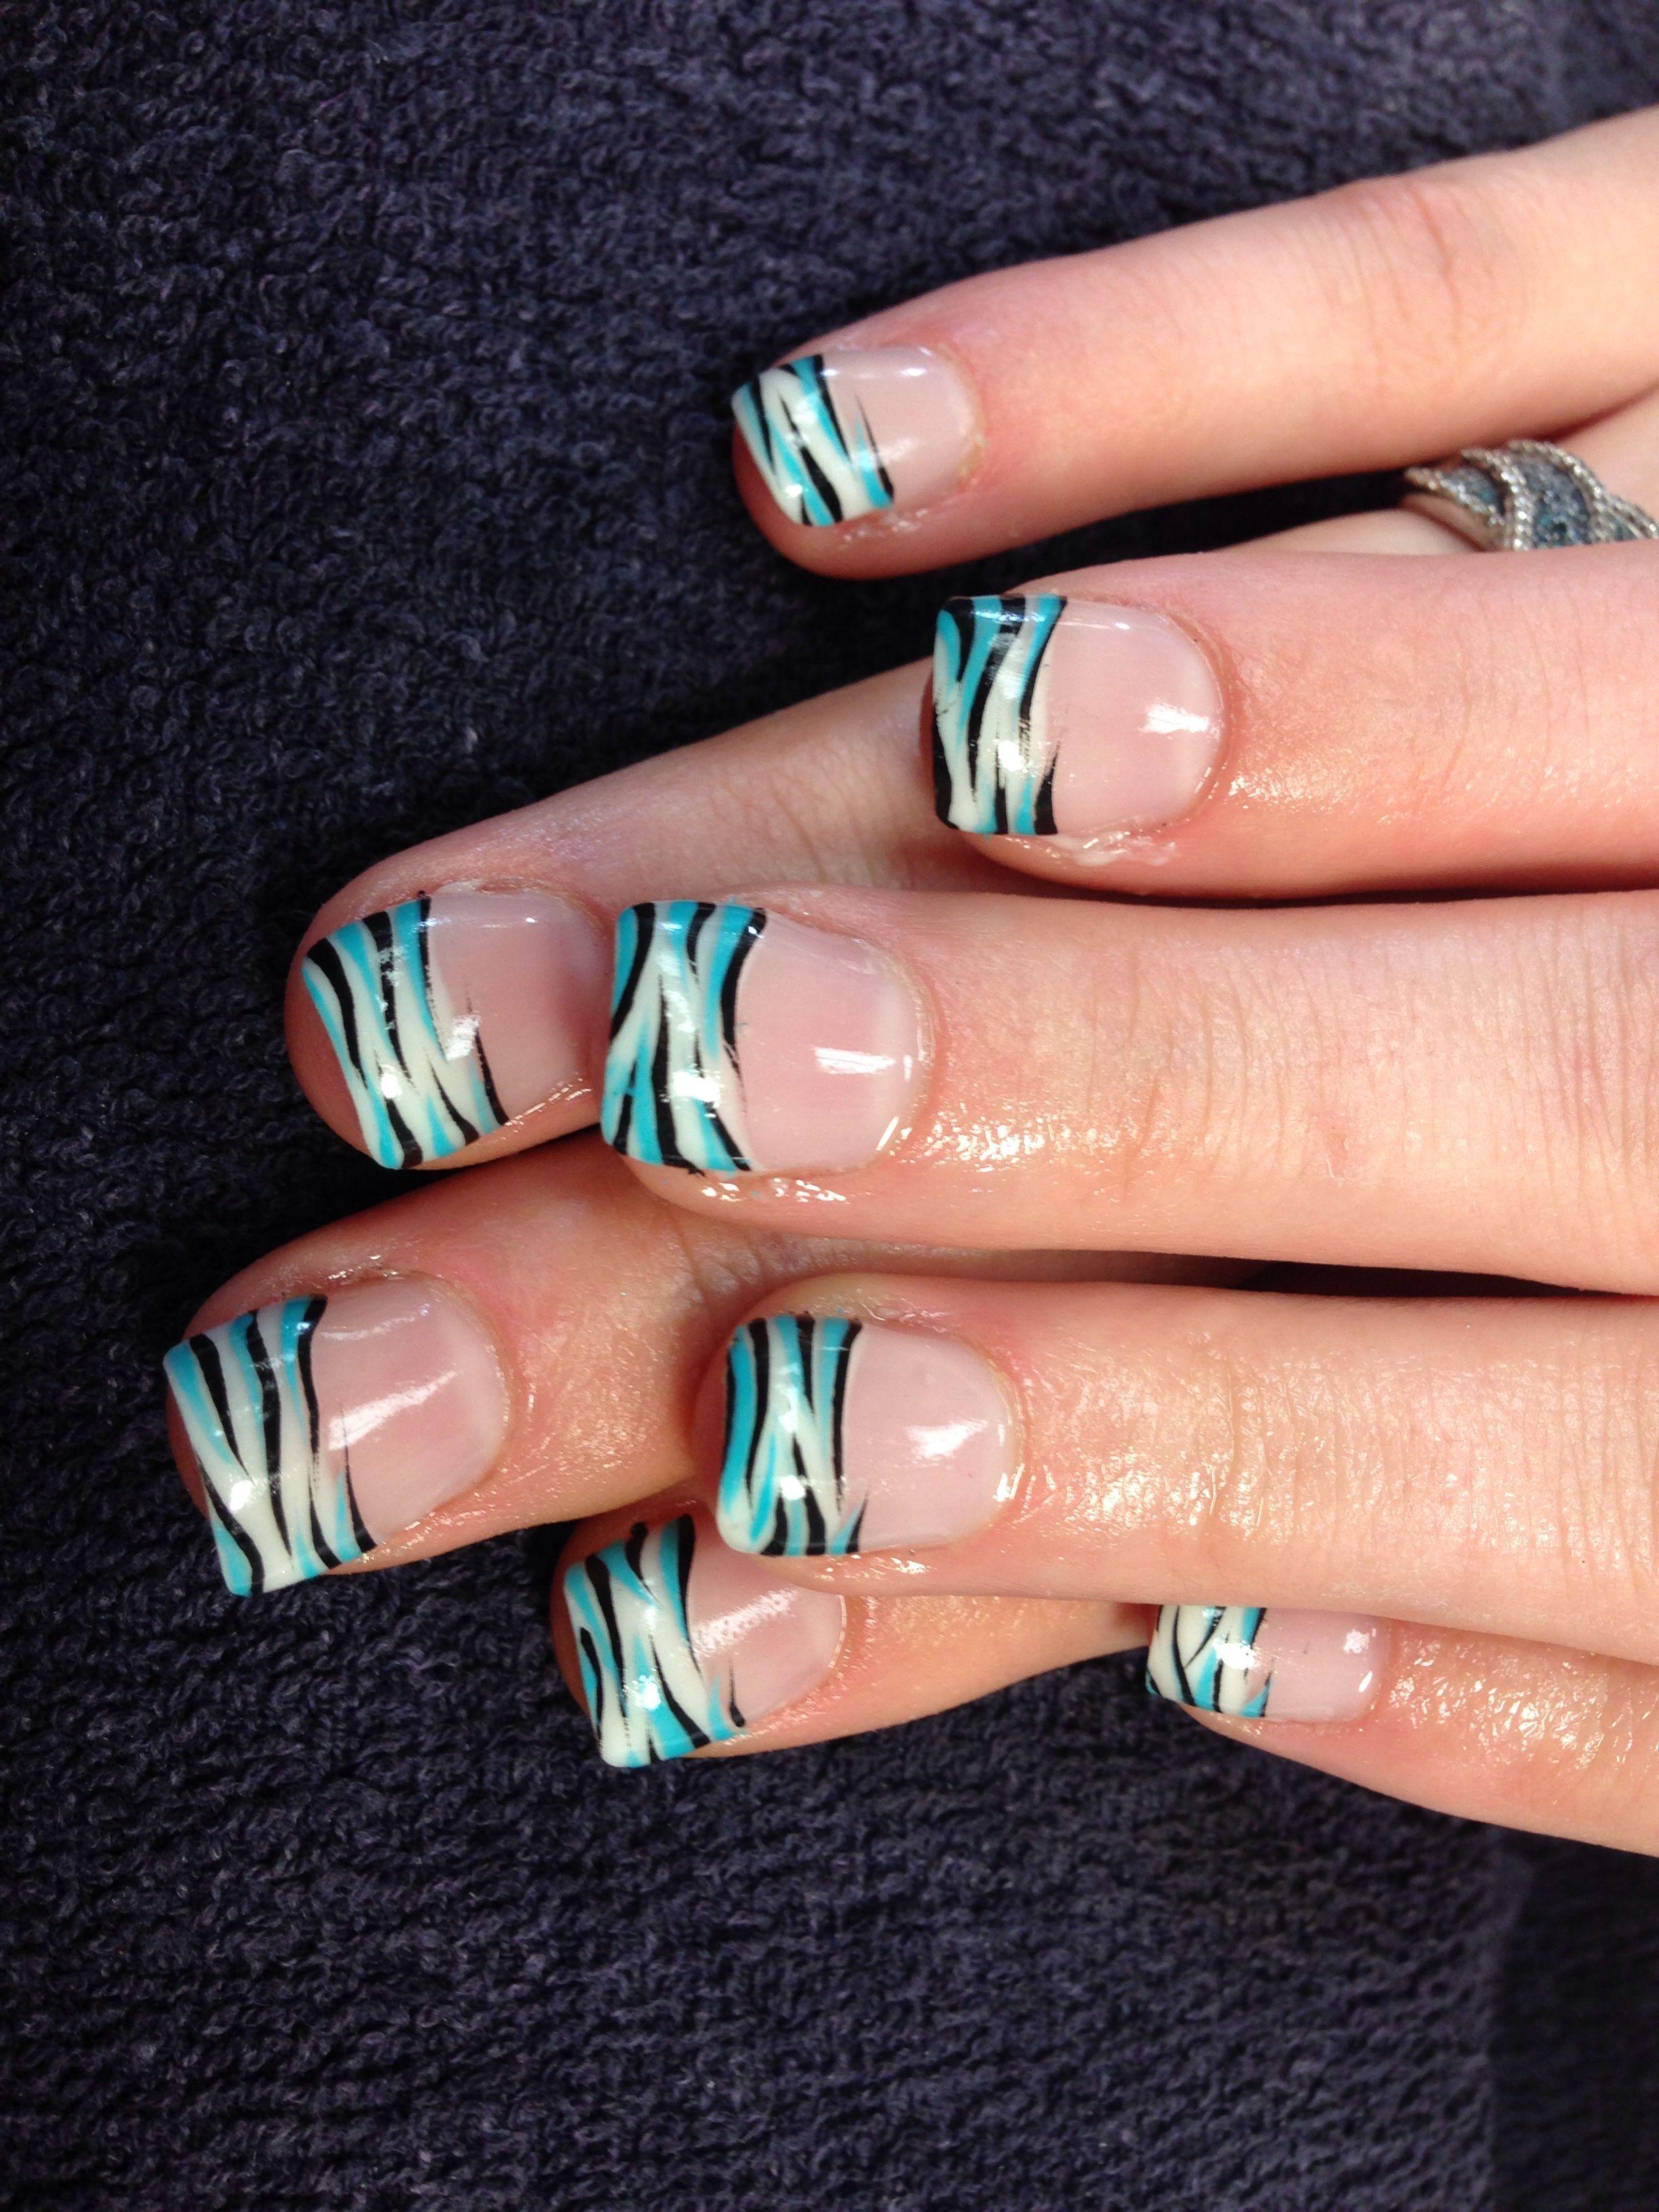 Desa S Nails Zebra Striped Gel Nail Art Zebra Nails Nail Tip Designs Gel Nail Art